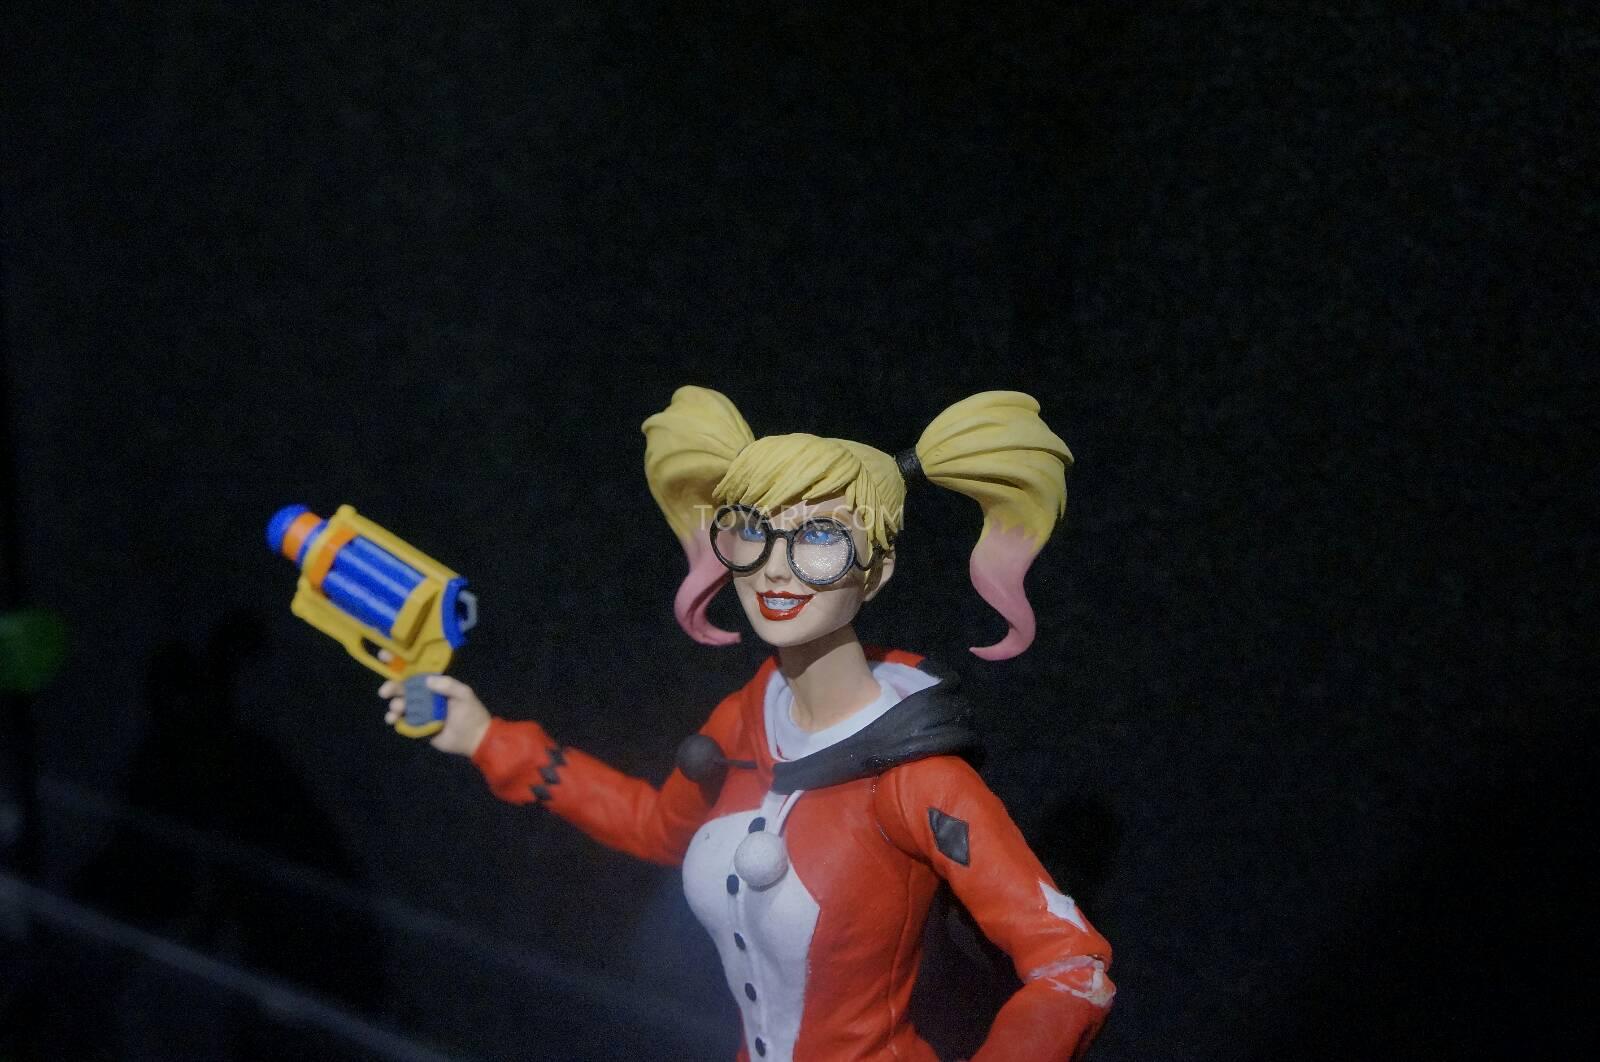 [Toy Fair 2014] DC Collectibles Toy-Fair-2014-DC-Collectibles-143